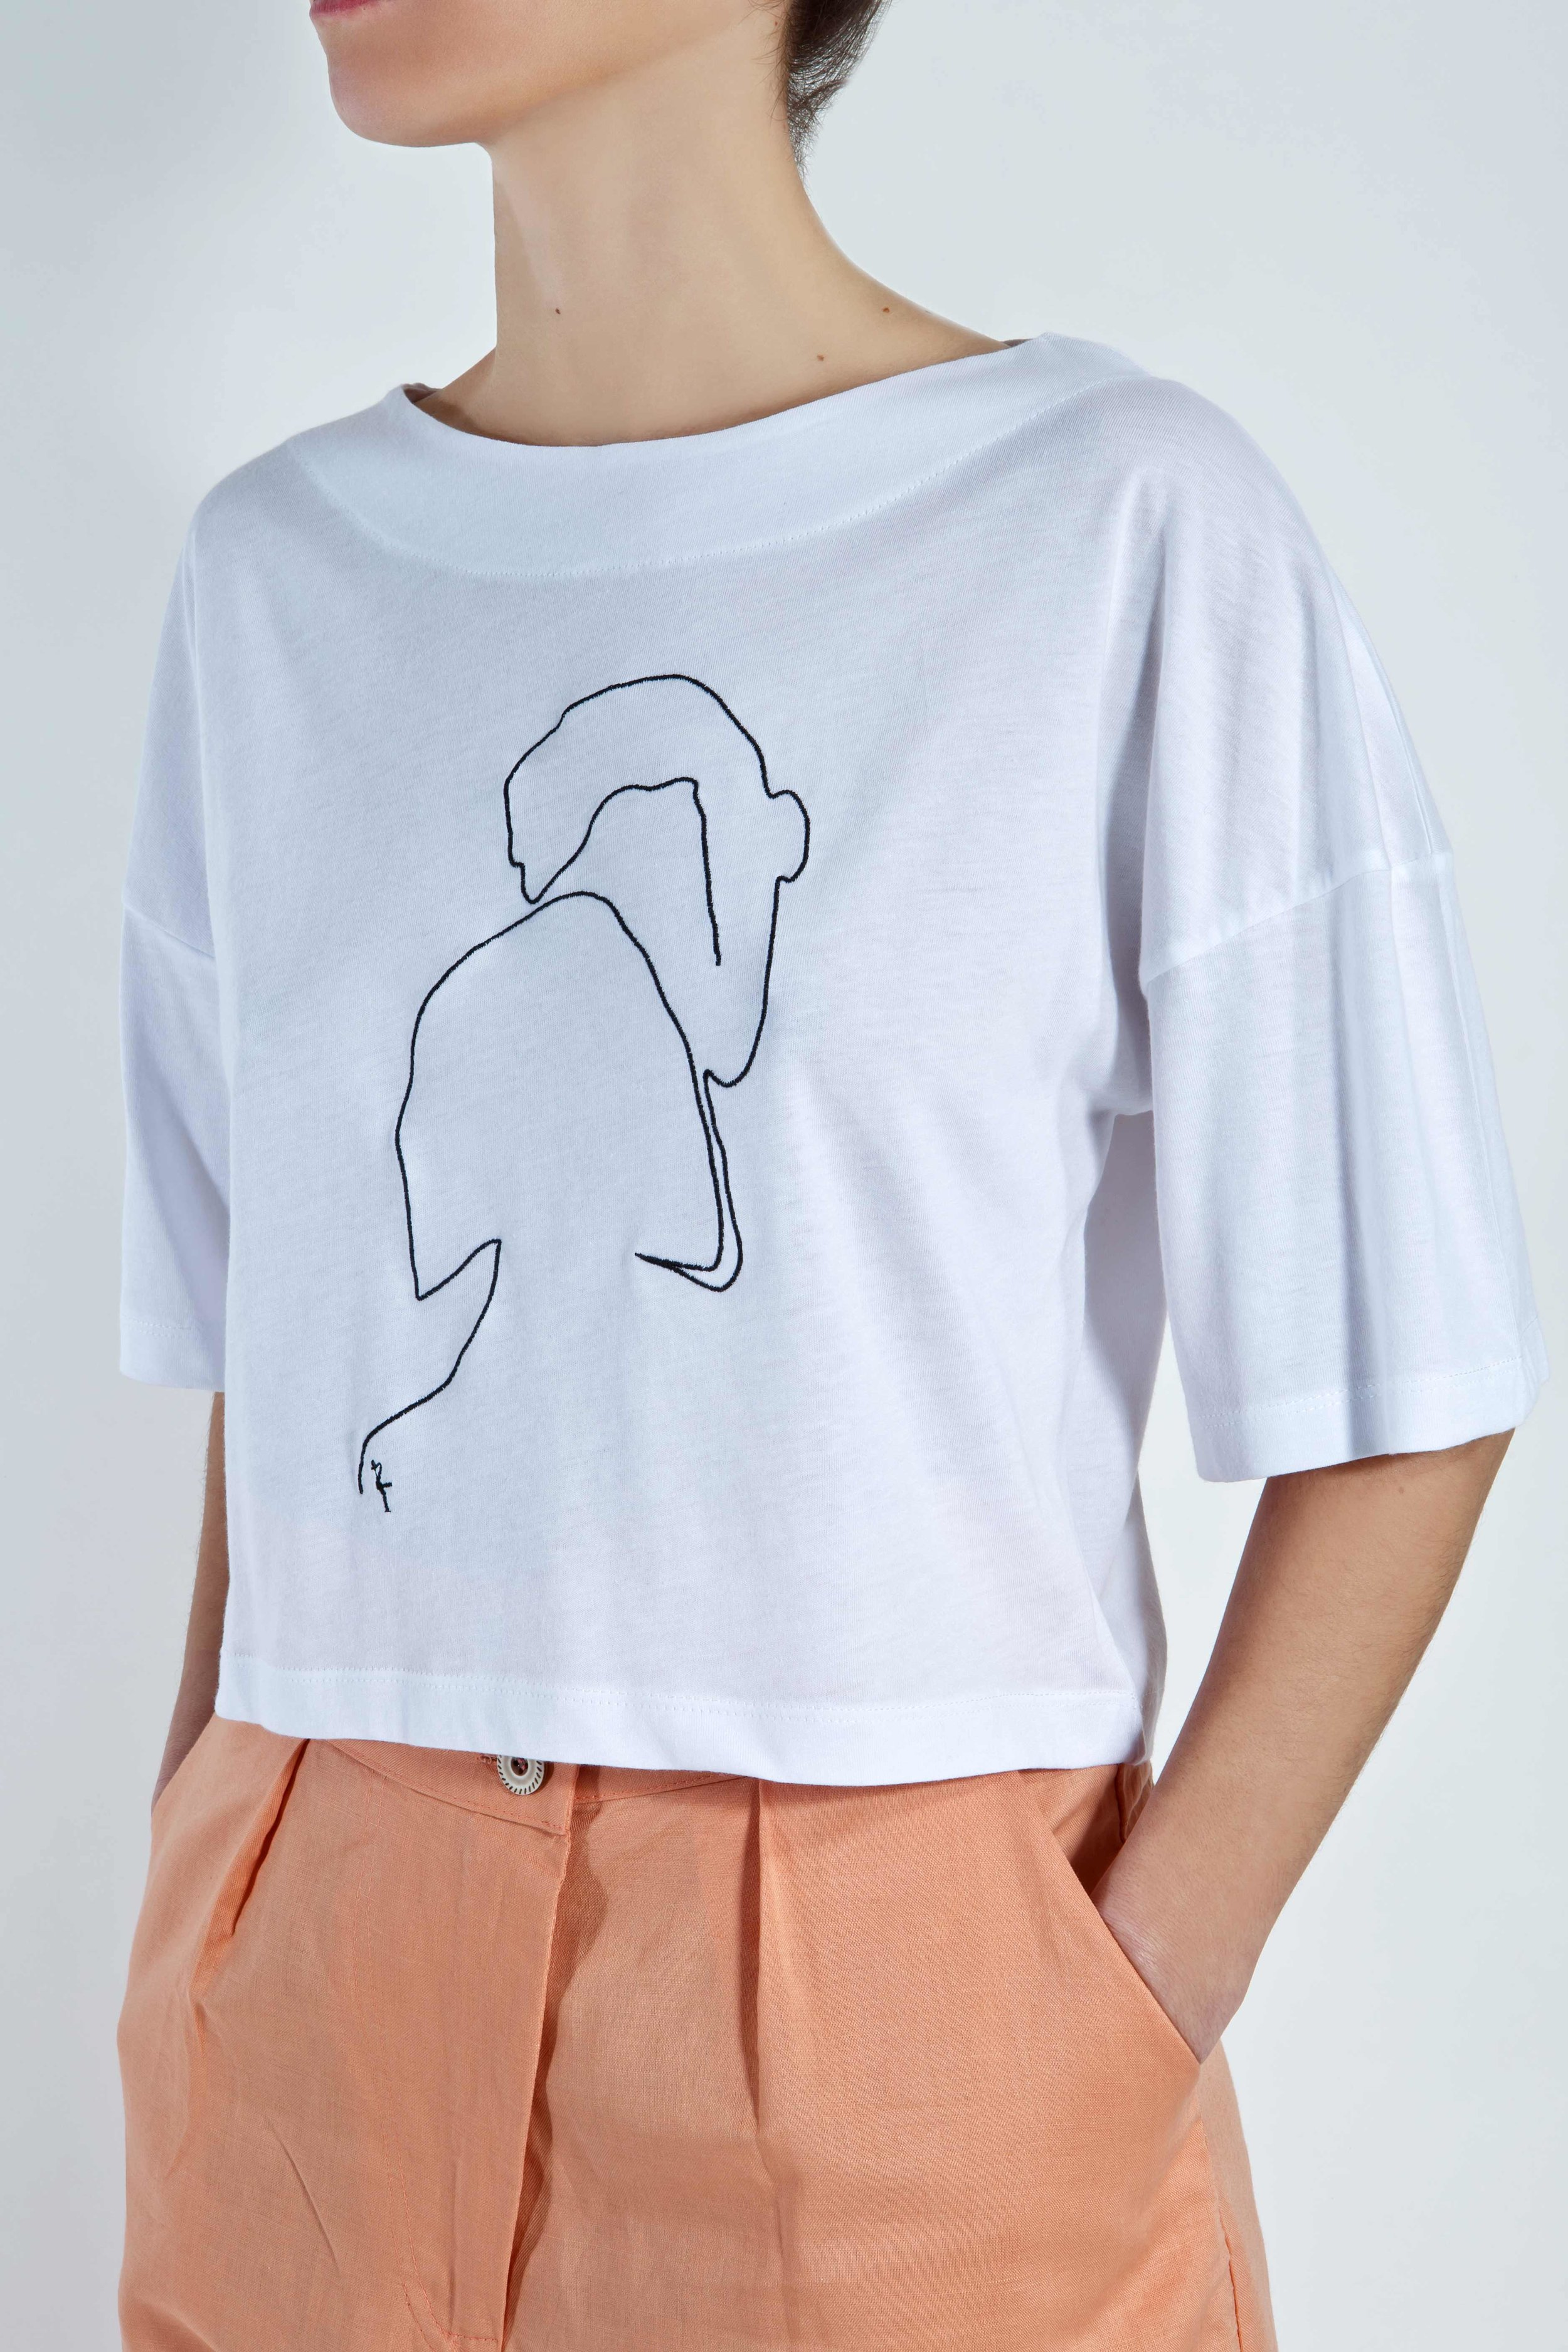 T-Shirt Phaino - White - Couple